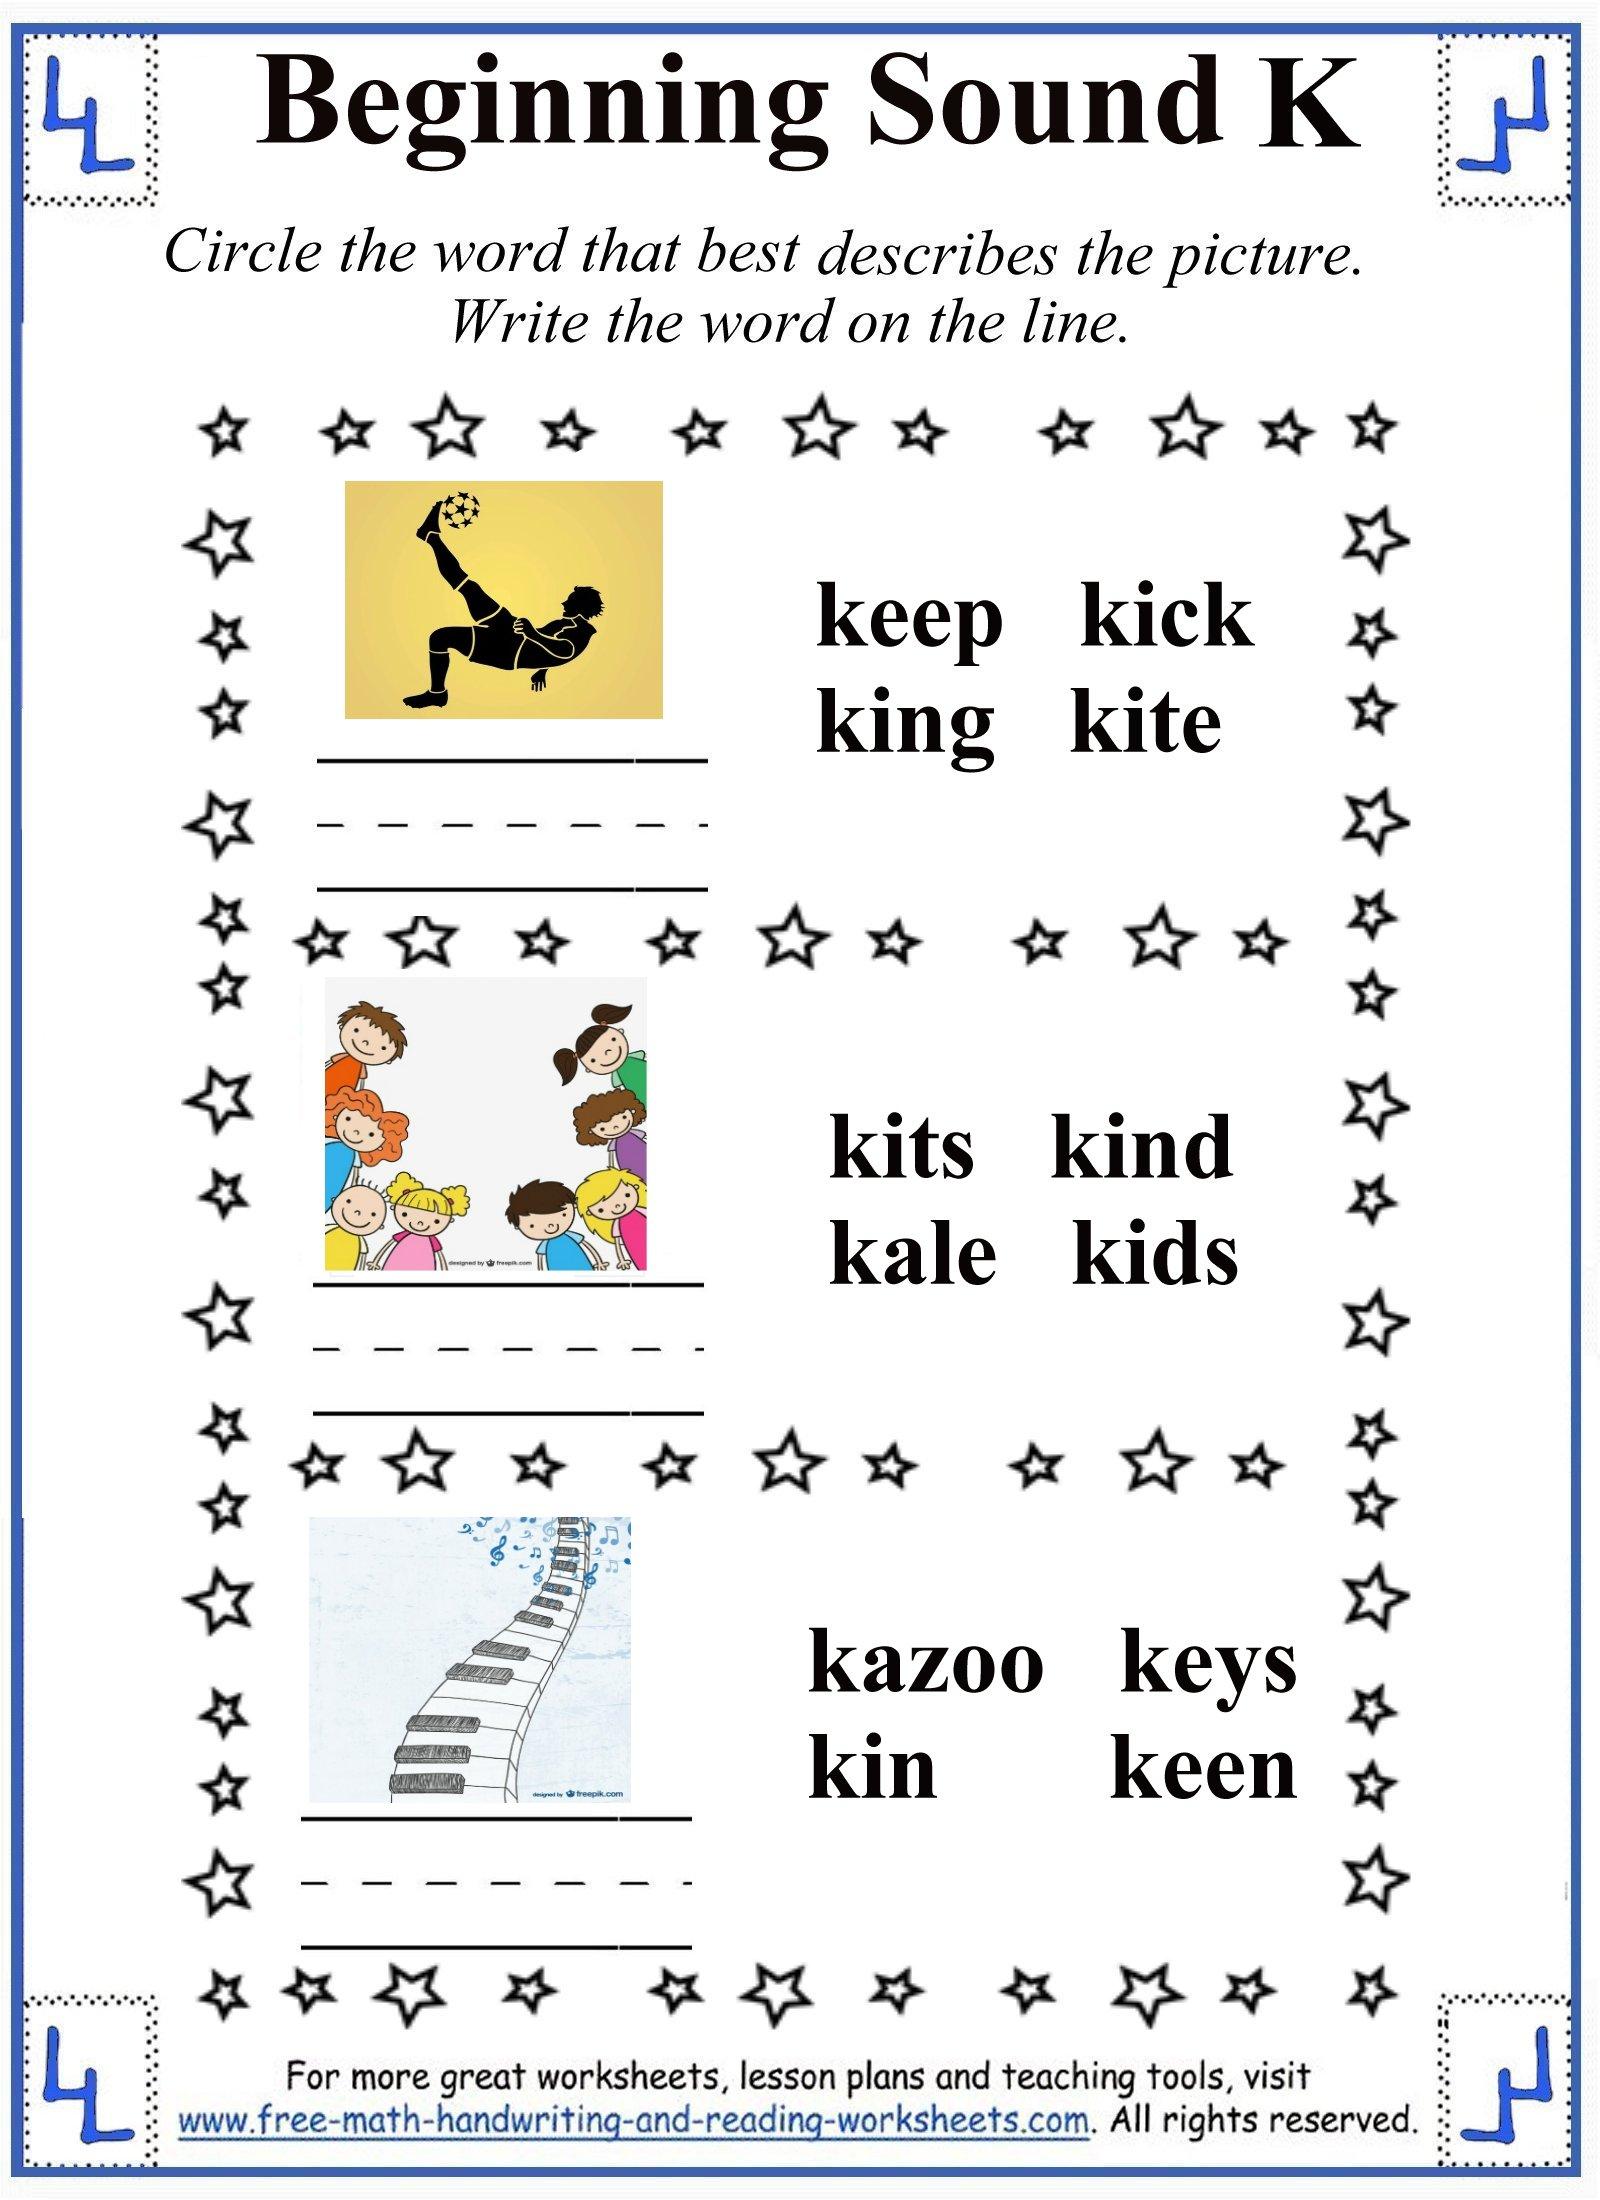 Letter K Worksheets & Activities regarding Letter K Worksheets 1St Grade